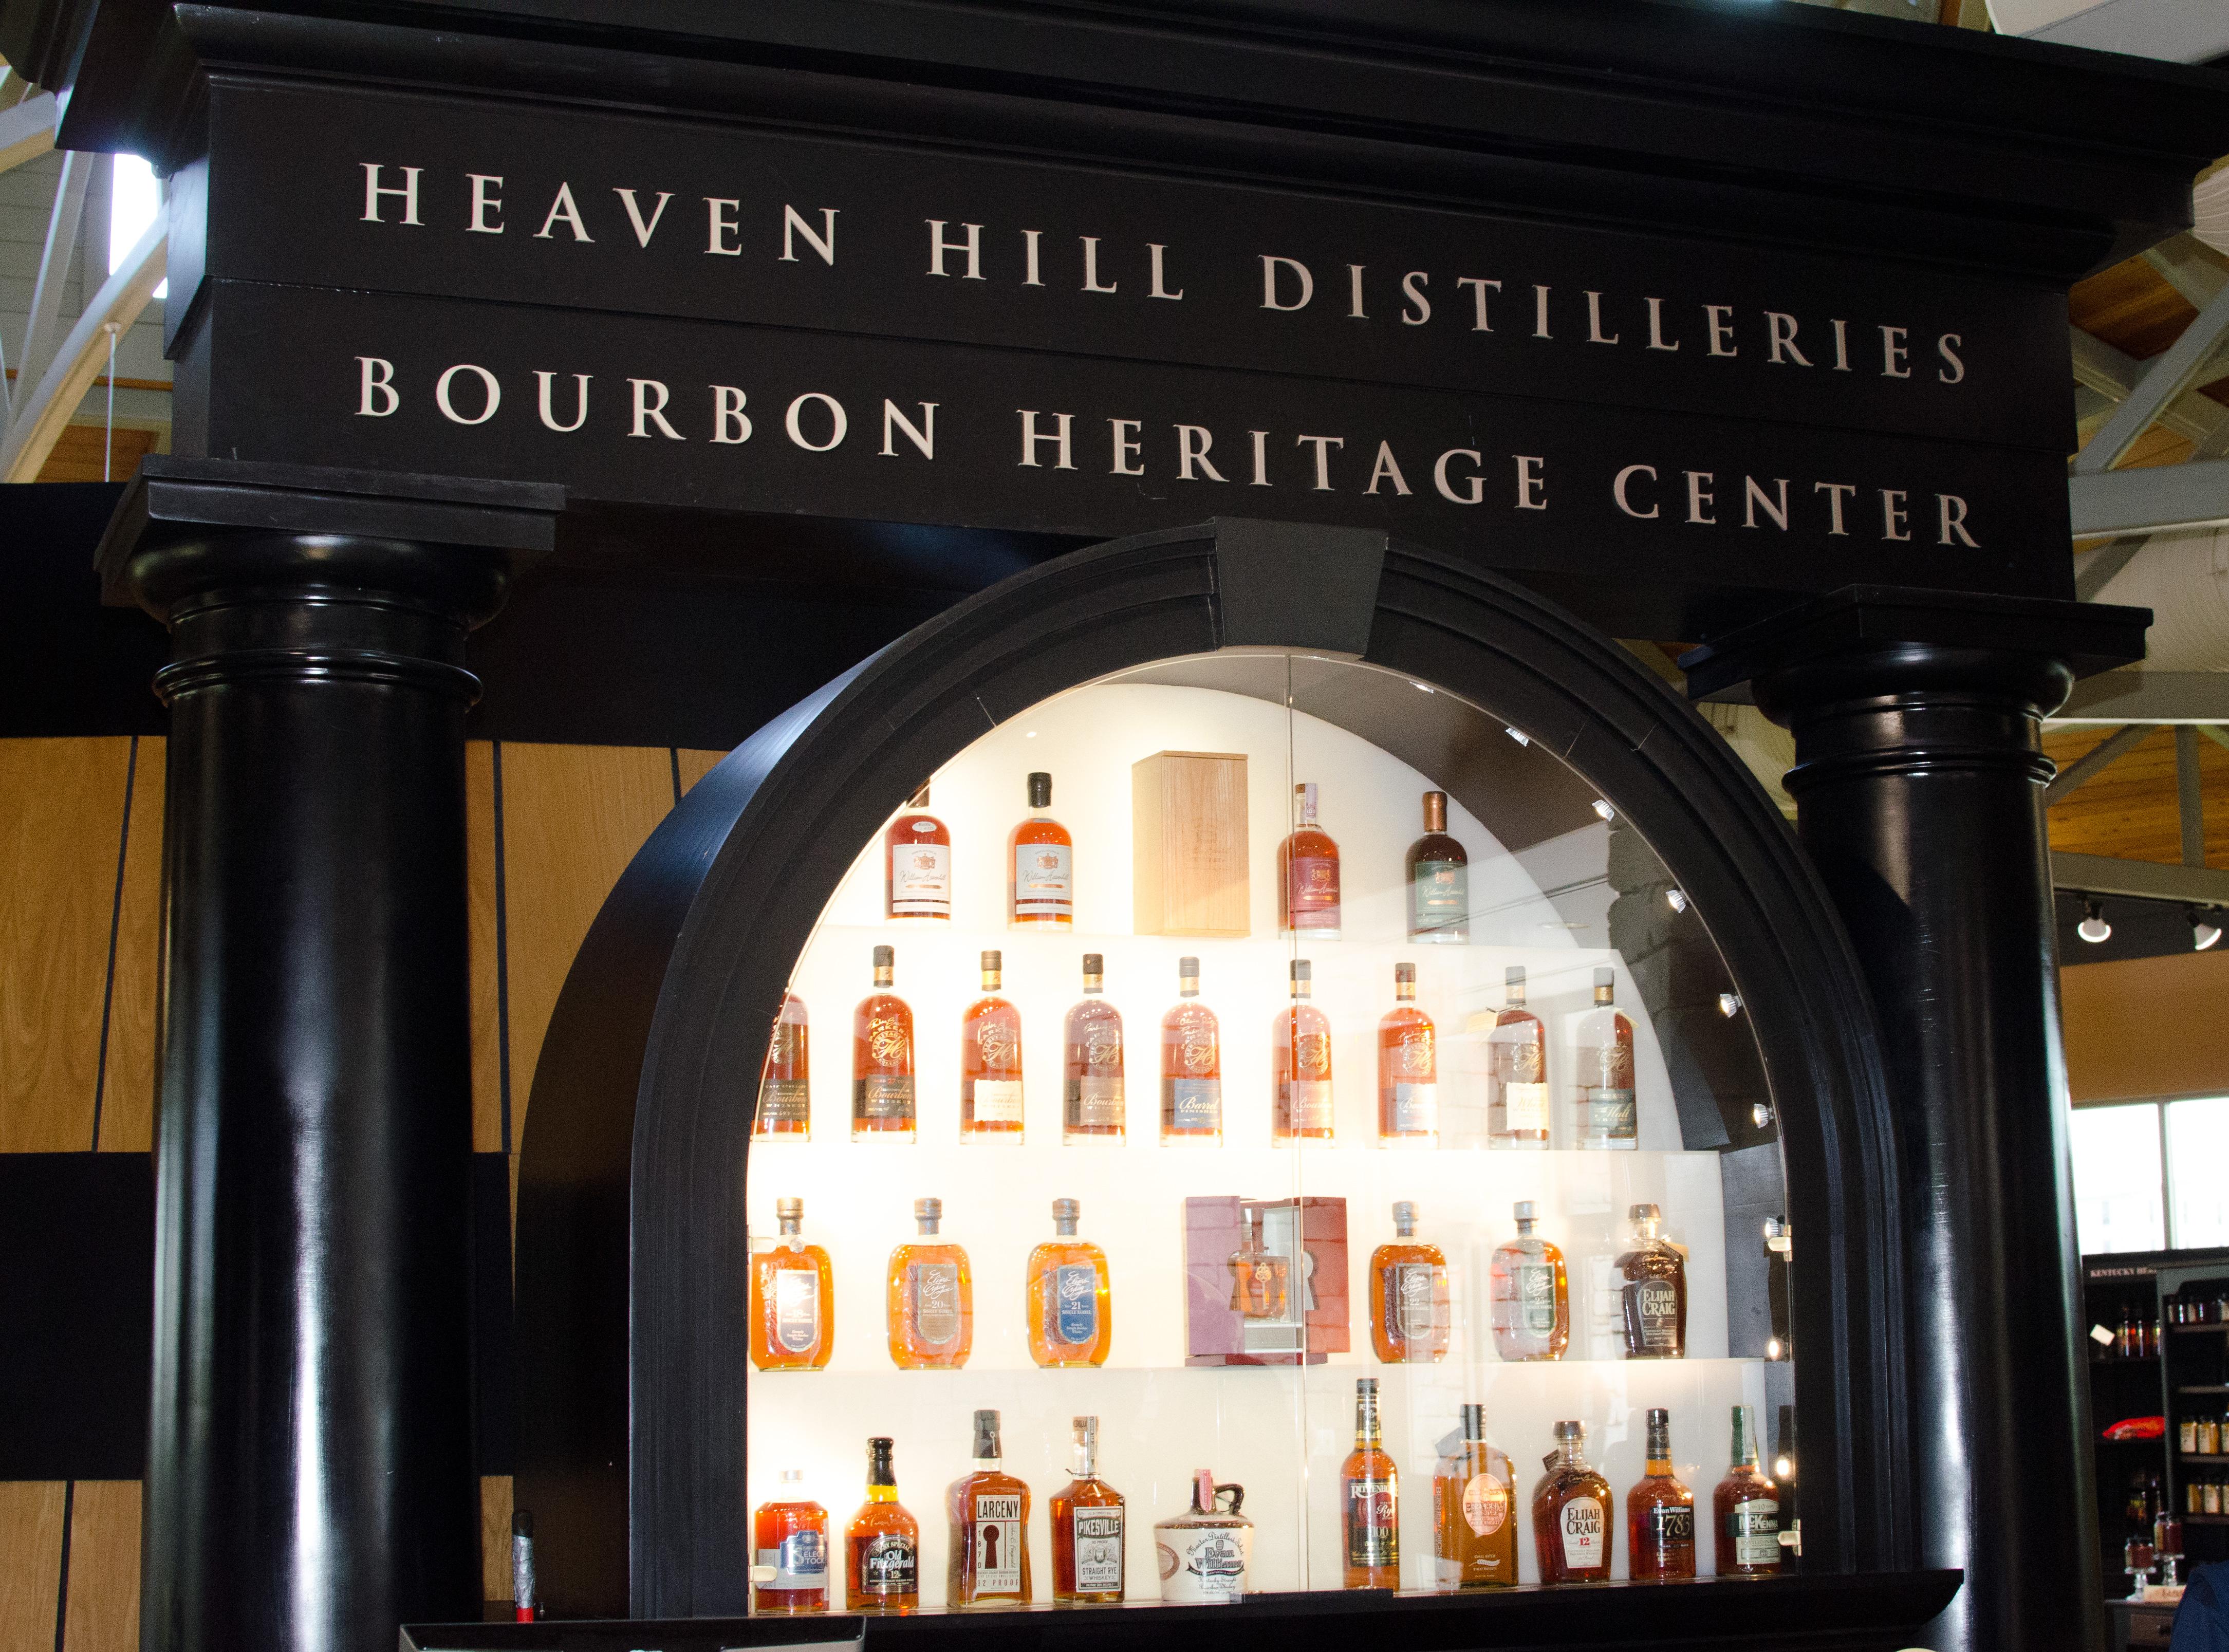 bourbonheritagecenter_heavenhill